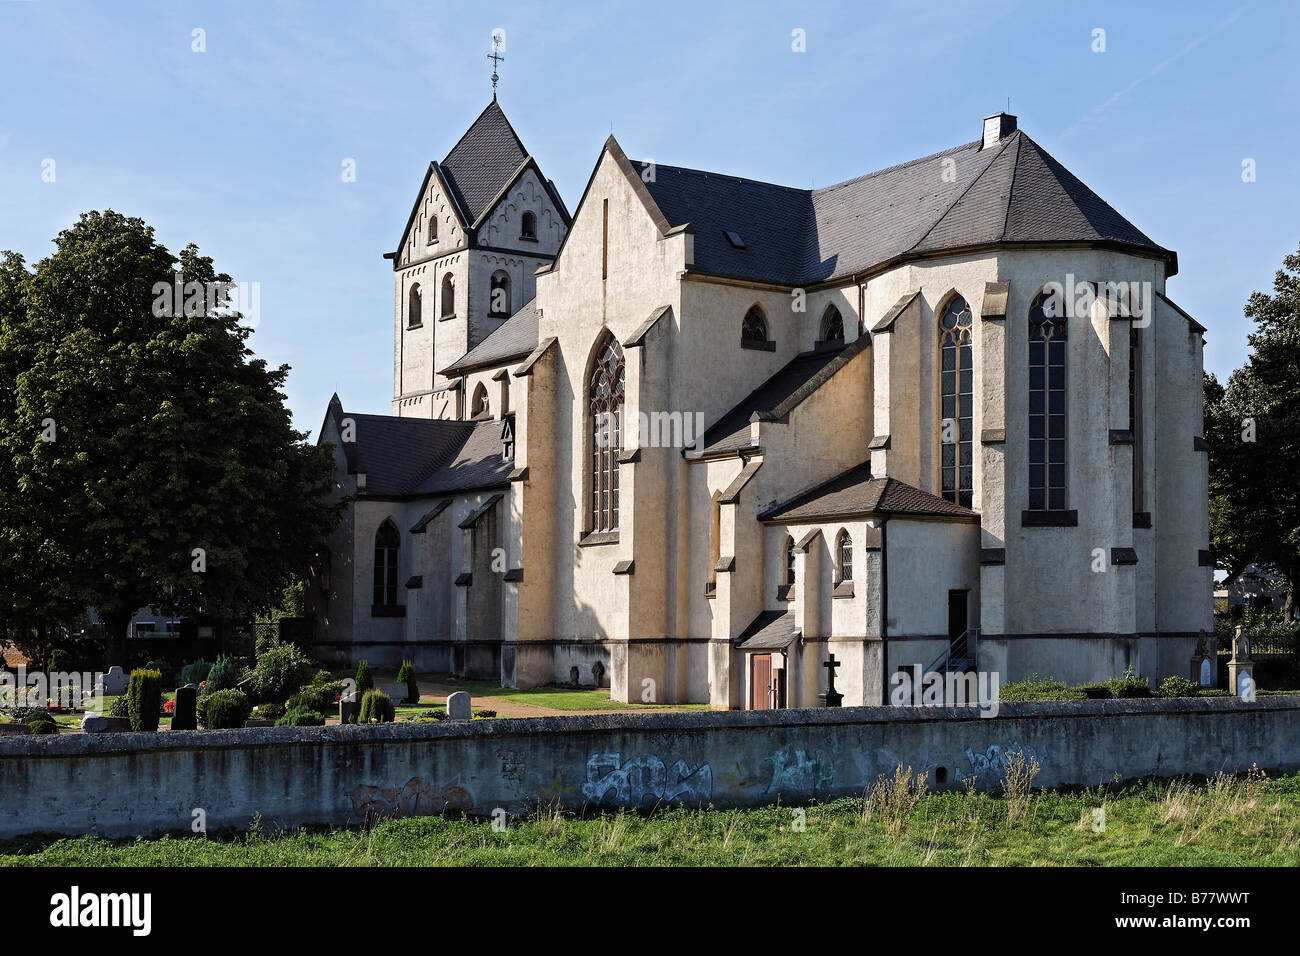 St. Matthias Church, built in 12th century, Hohenbudberg, Krefeld-Uerdingen, Rhineland, North Rhine-Westphalia, - Stock Image